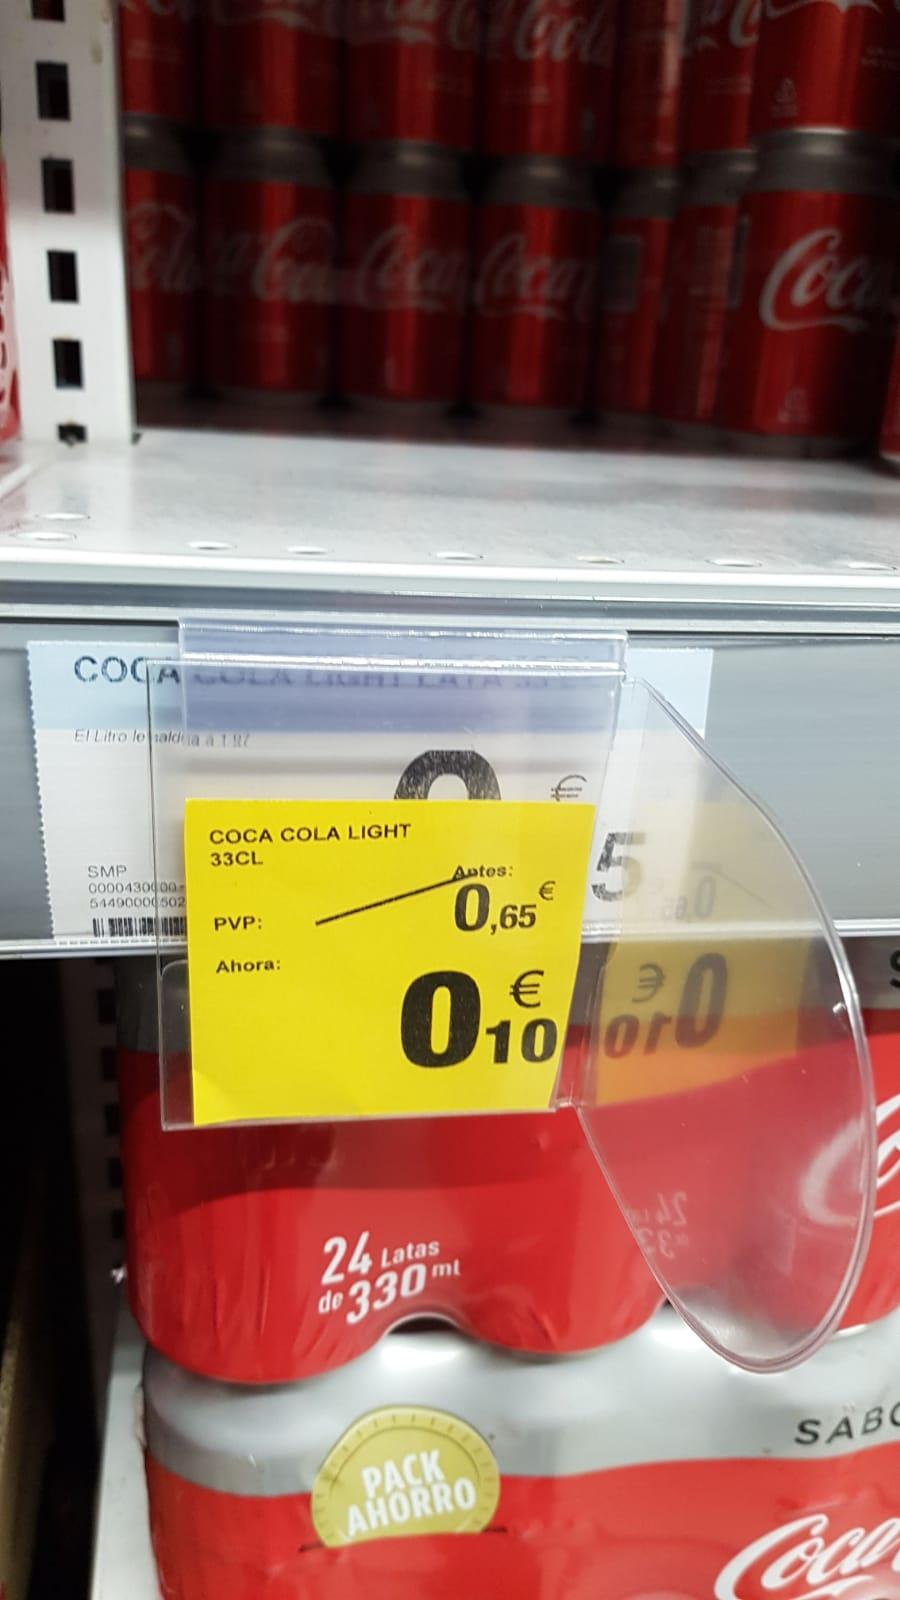 Coca cola light 33cl a 0.10€ - cad: 04/20 carrefour aluche